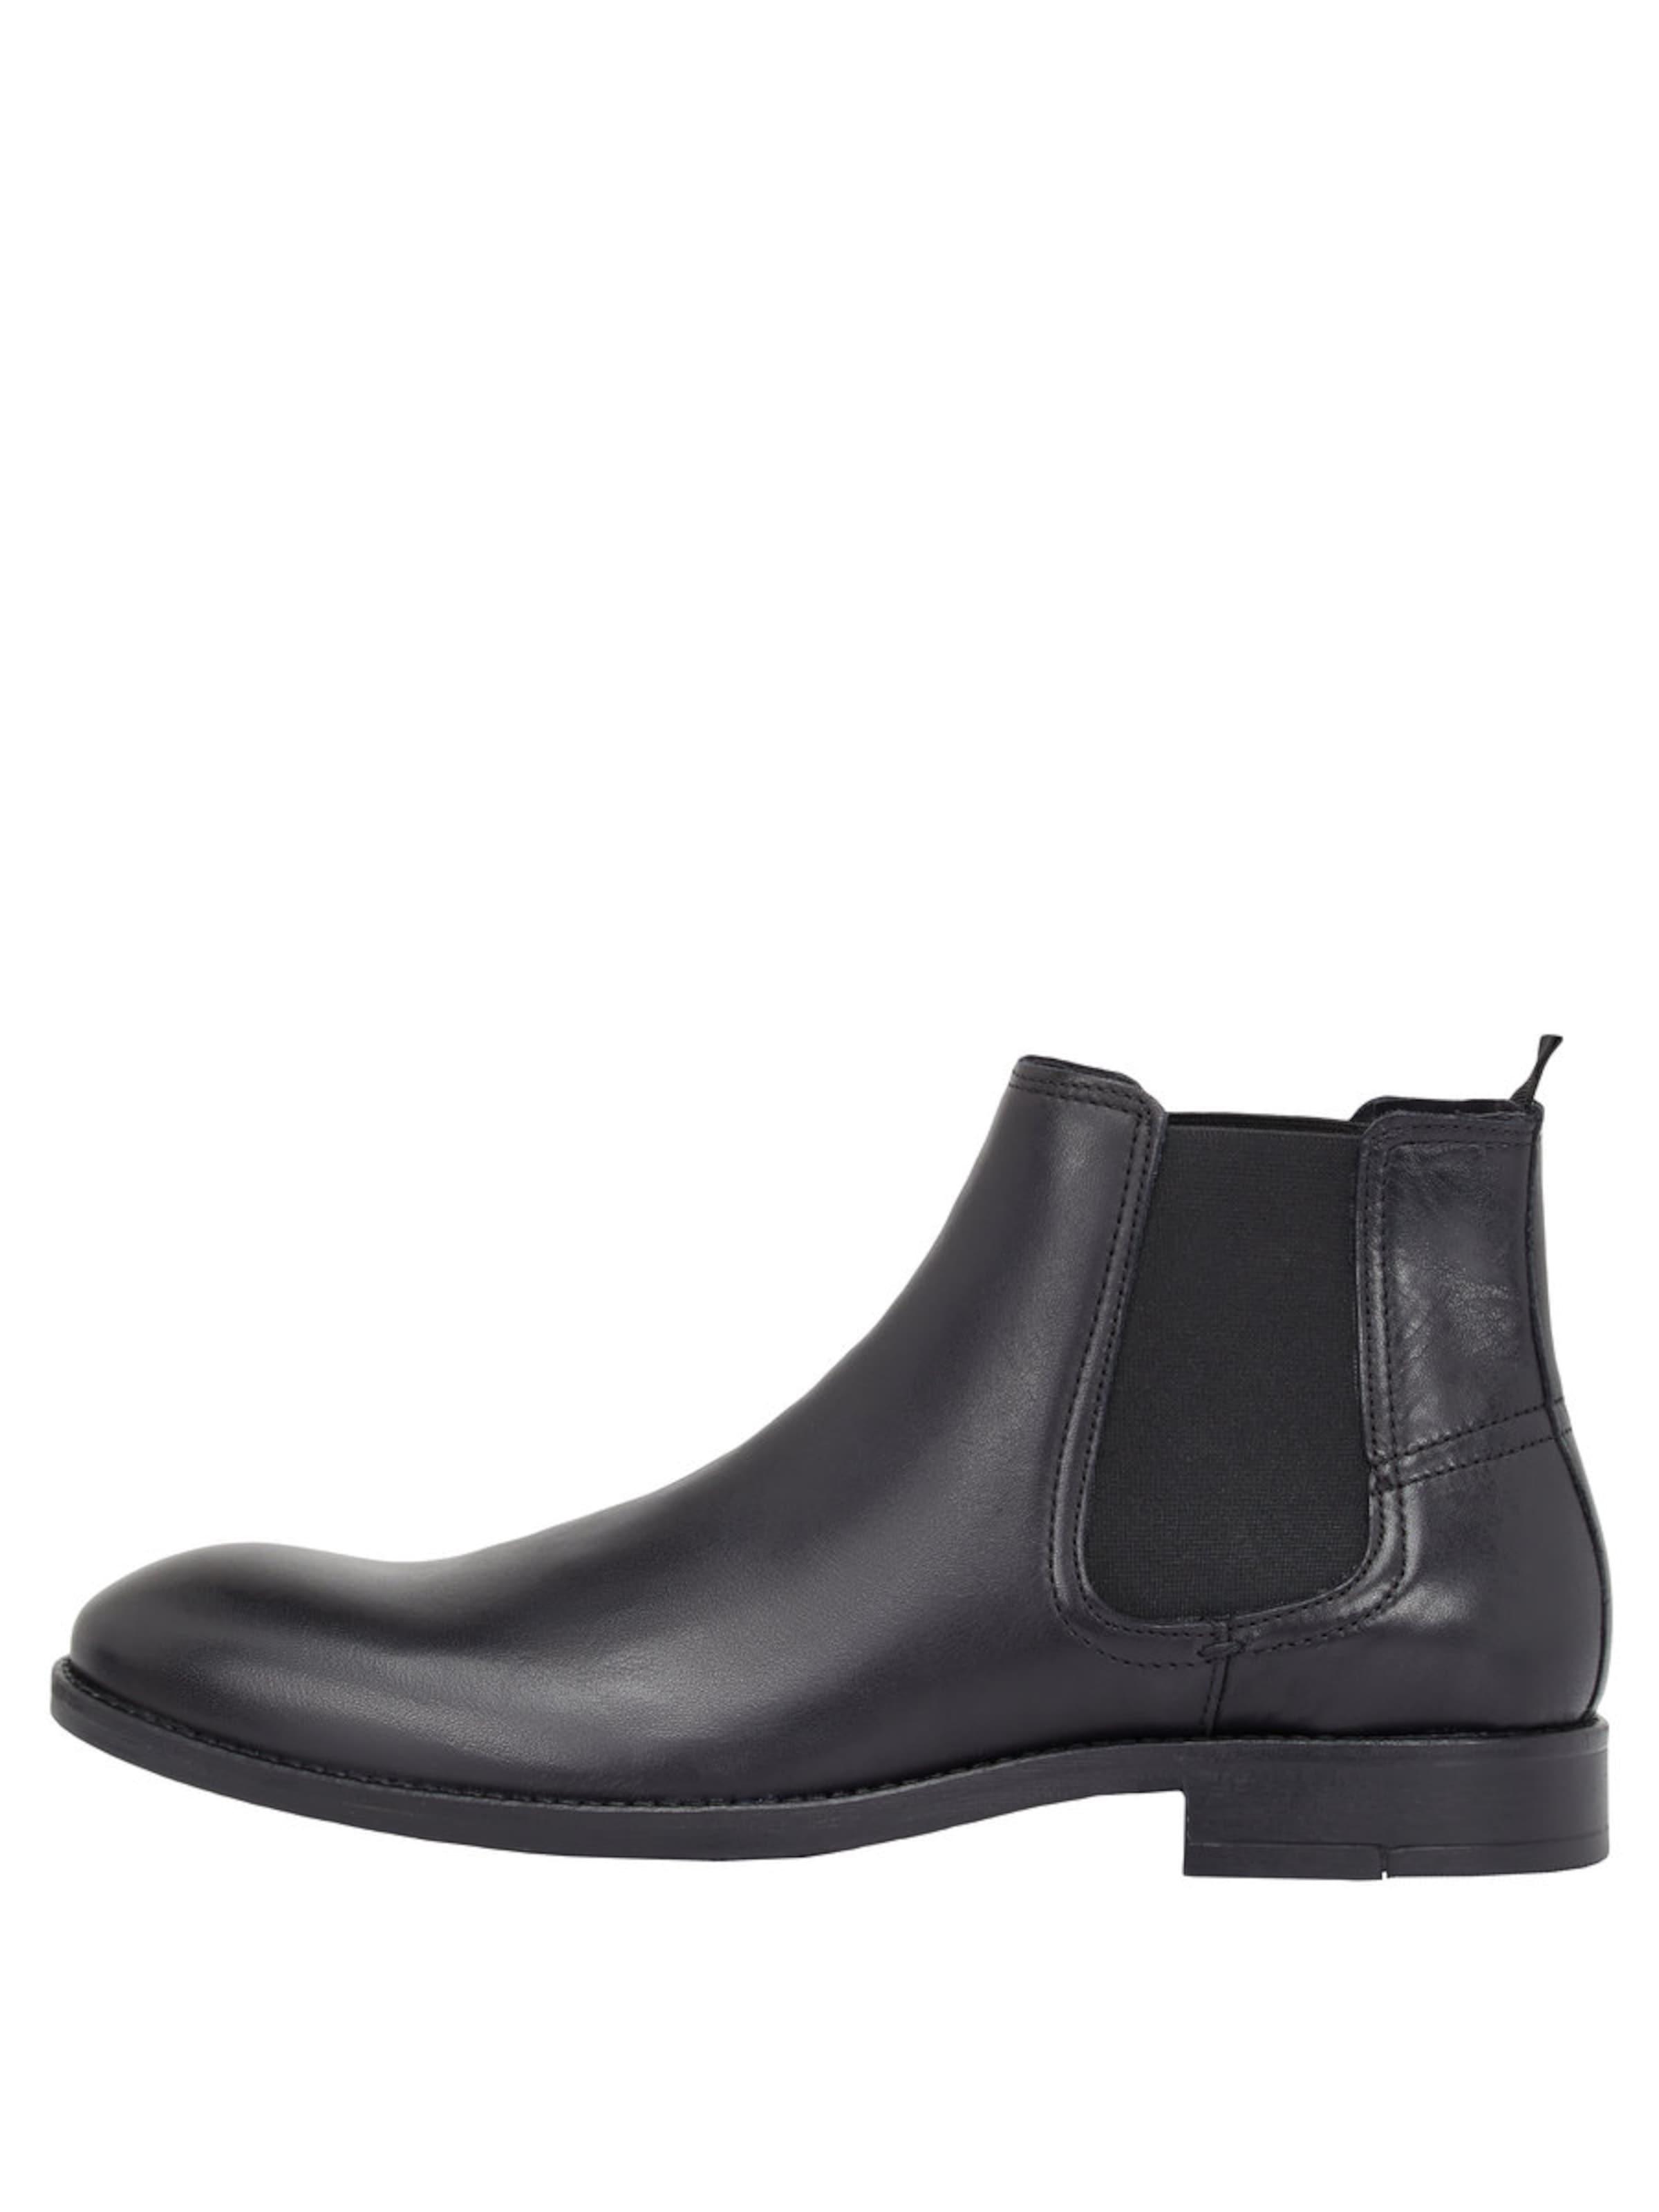 Bianco Herren-Stiefel Klassische Verschleißfeste billige Schuhe